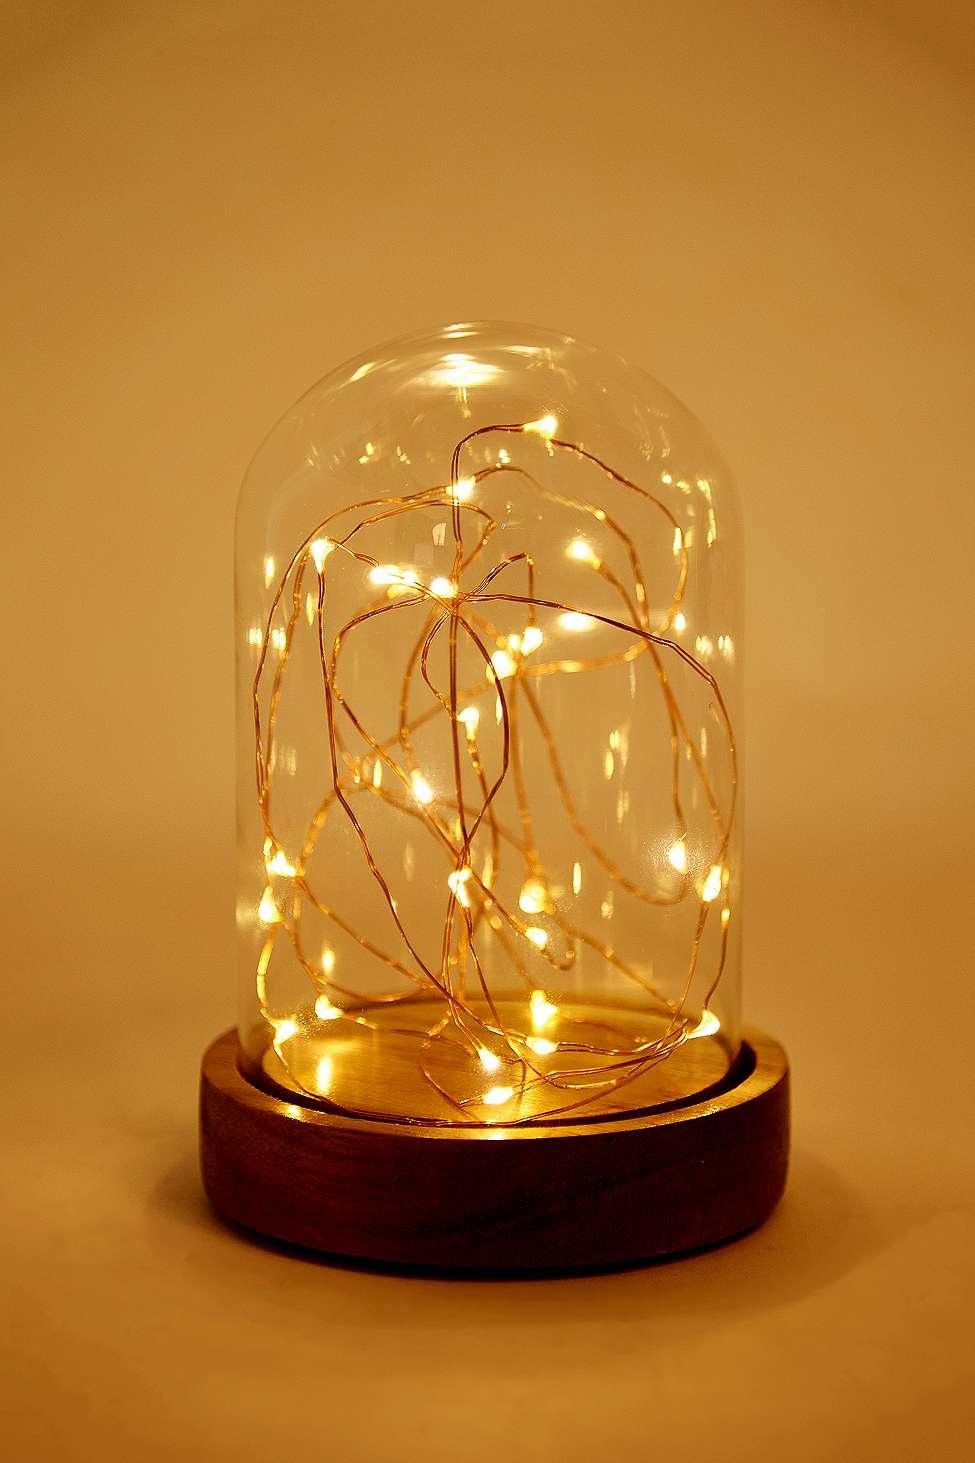 Lampe Sous Cloche mini lampe guirlande sous cloche | urban outfitters fr